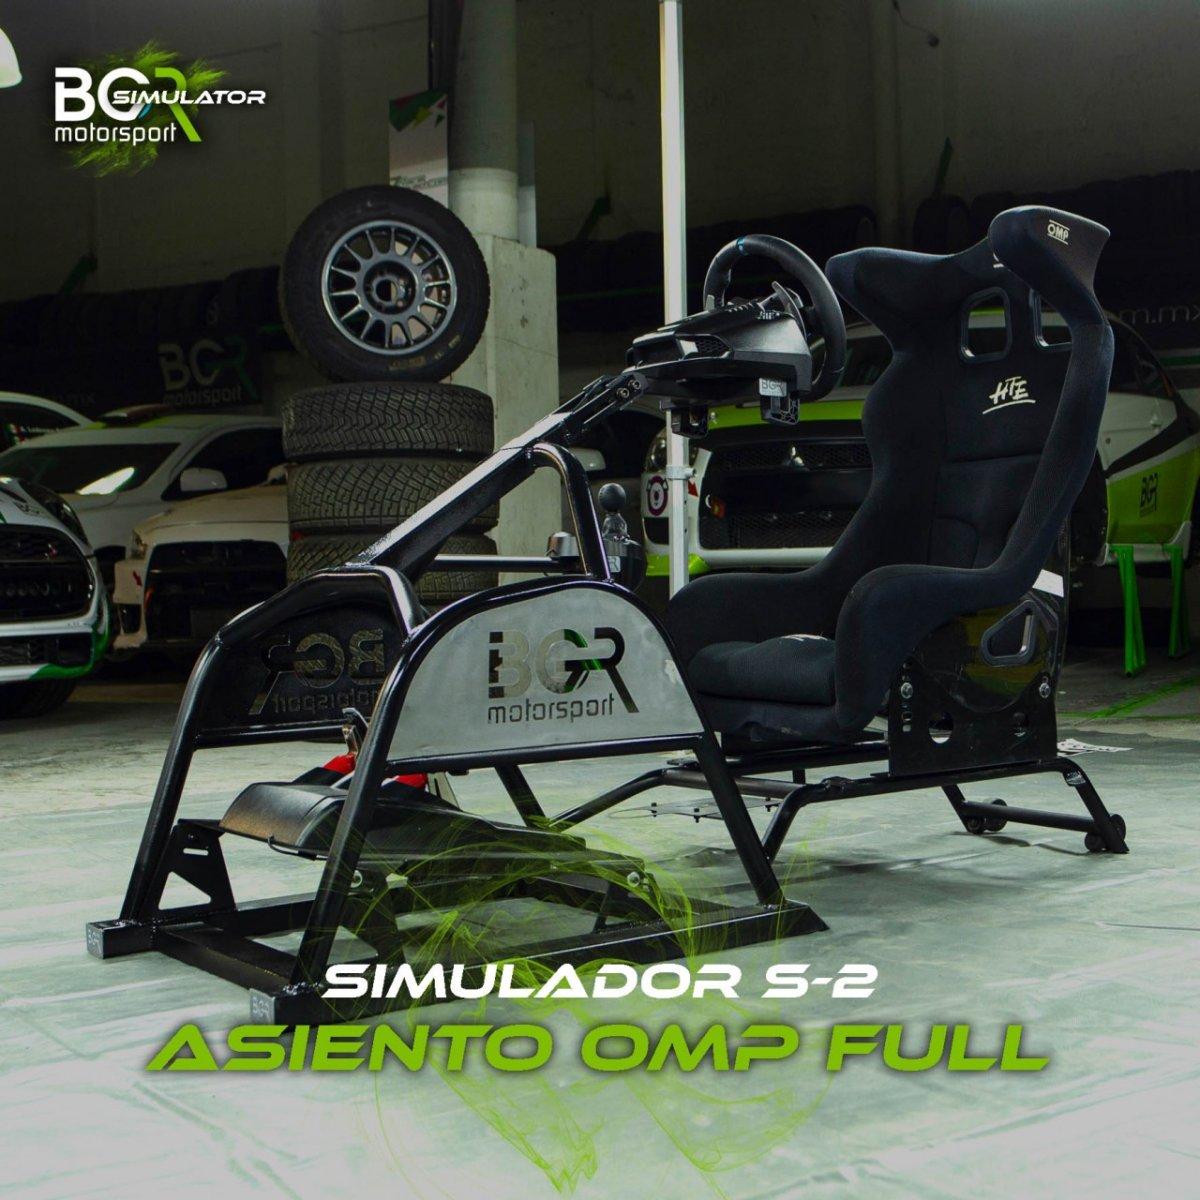 Simulador S2 Asiento OMP Full